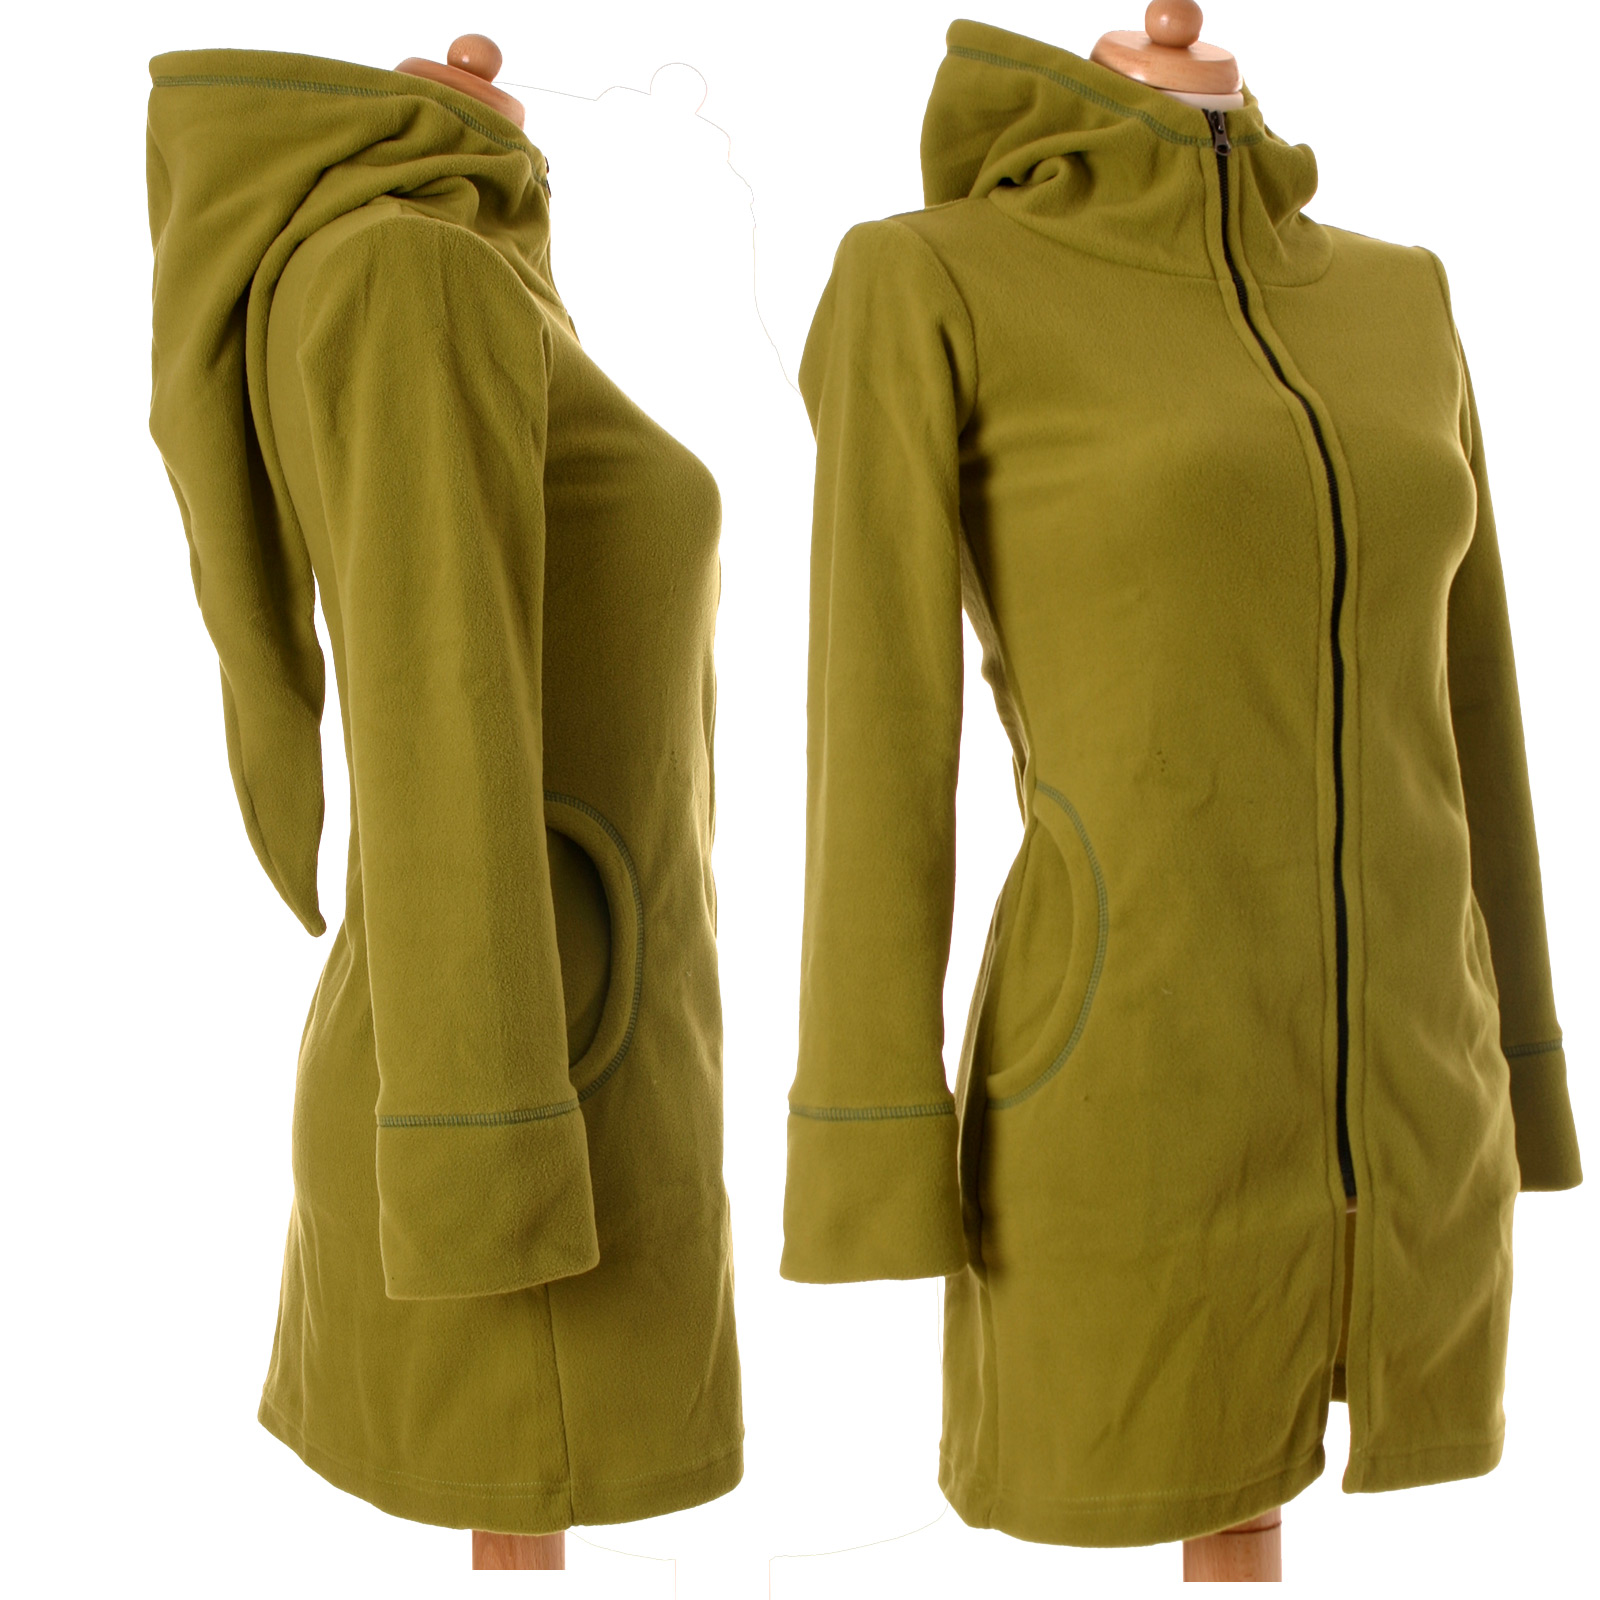 damen fleece mantel jacke warm zipfelkapuze goa nepal larp. Black Bedroom Furniture Sets. Home Design Ideas